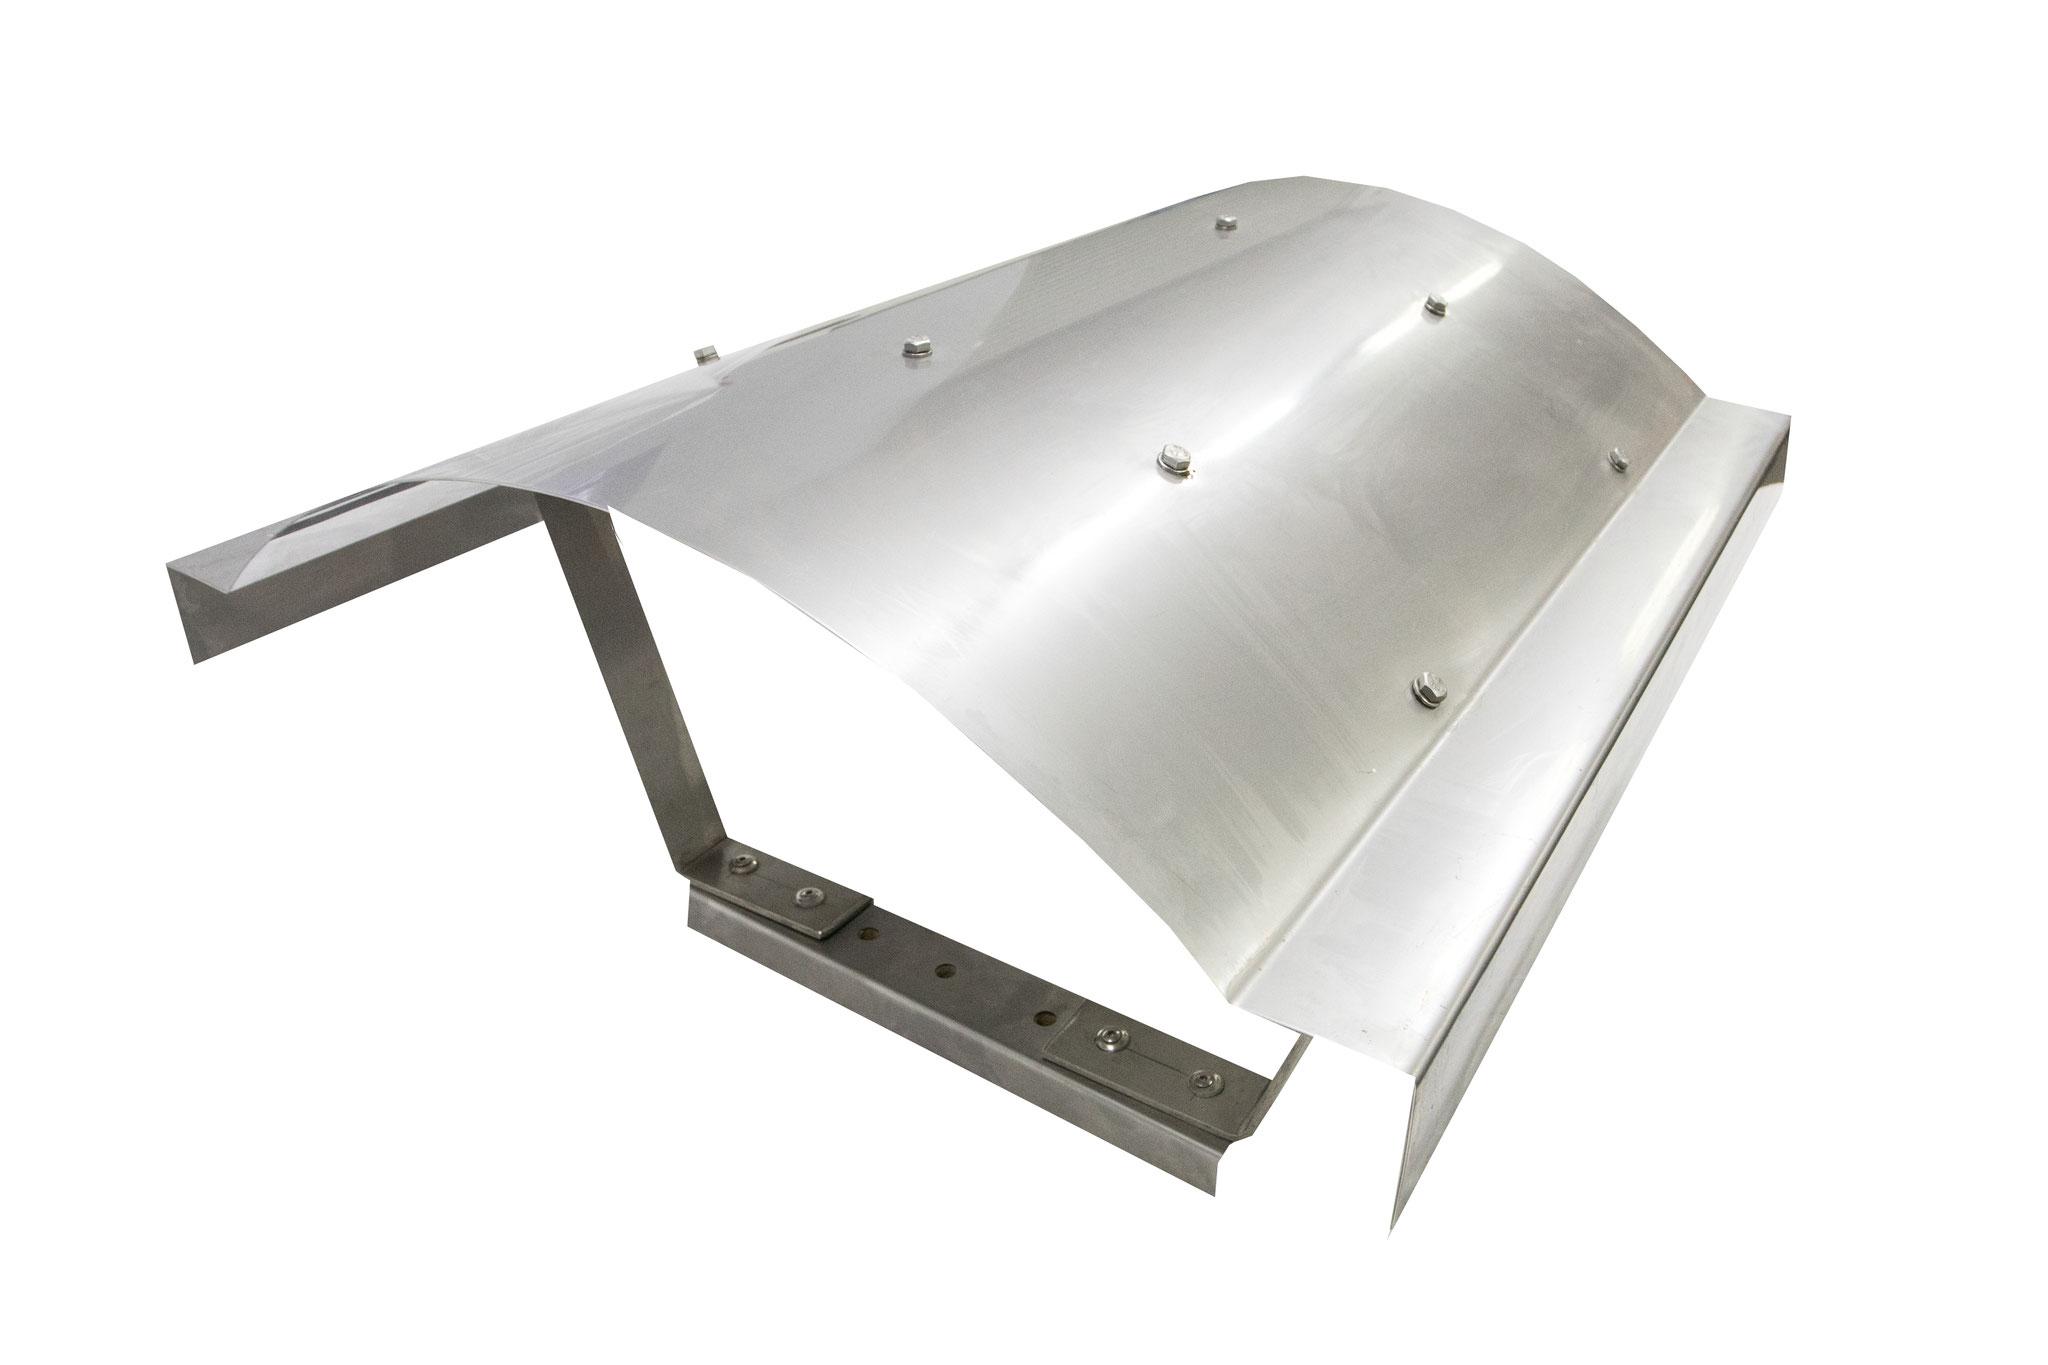 Kaminhaube Form 7 (in VA 1mm stark/in Kupfer 1,5 mm stark)